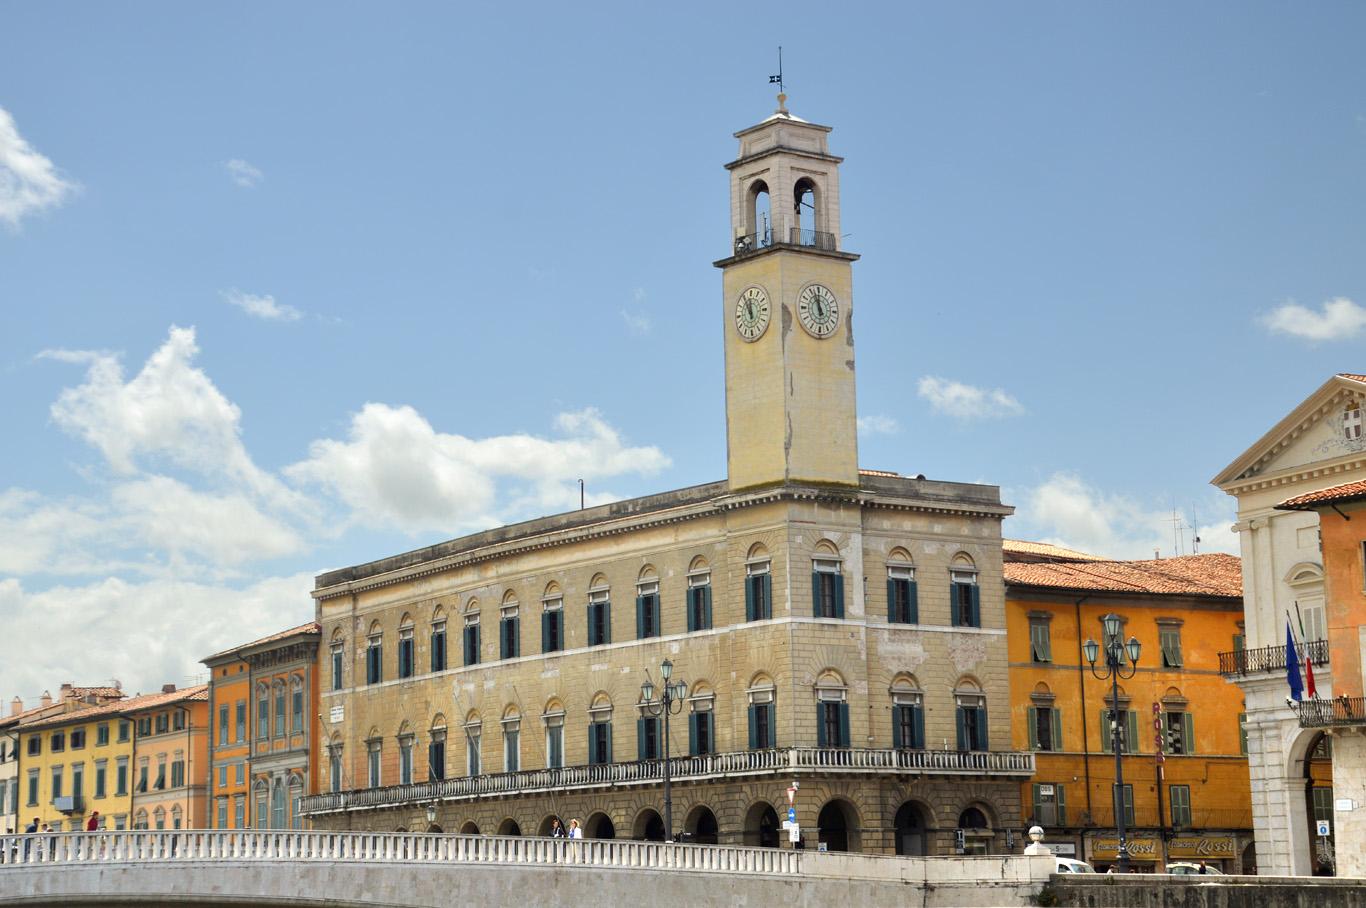 Architecture at the River Arno